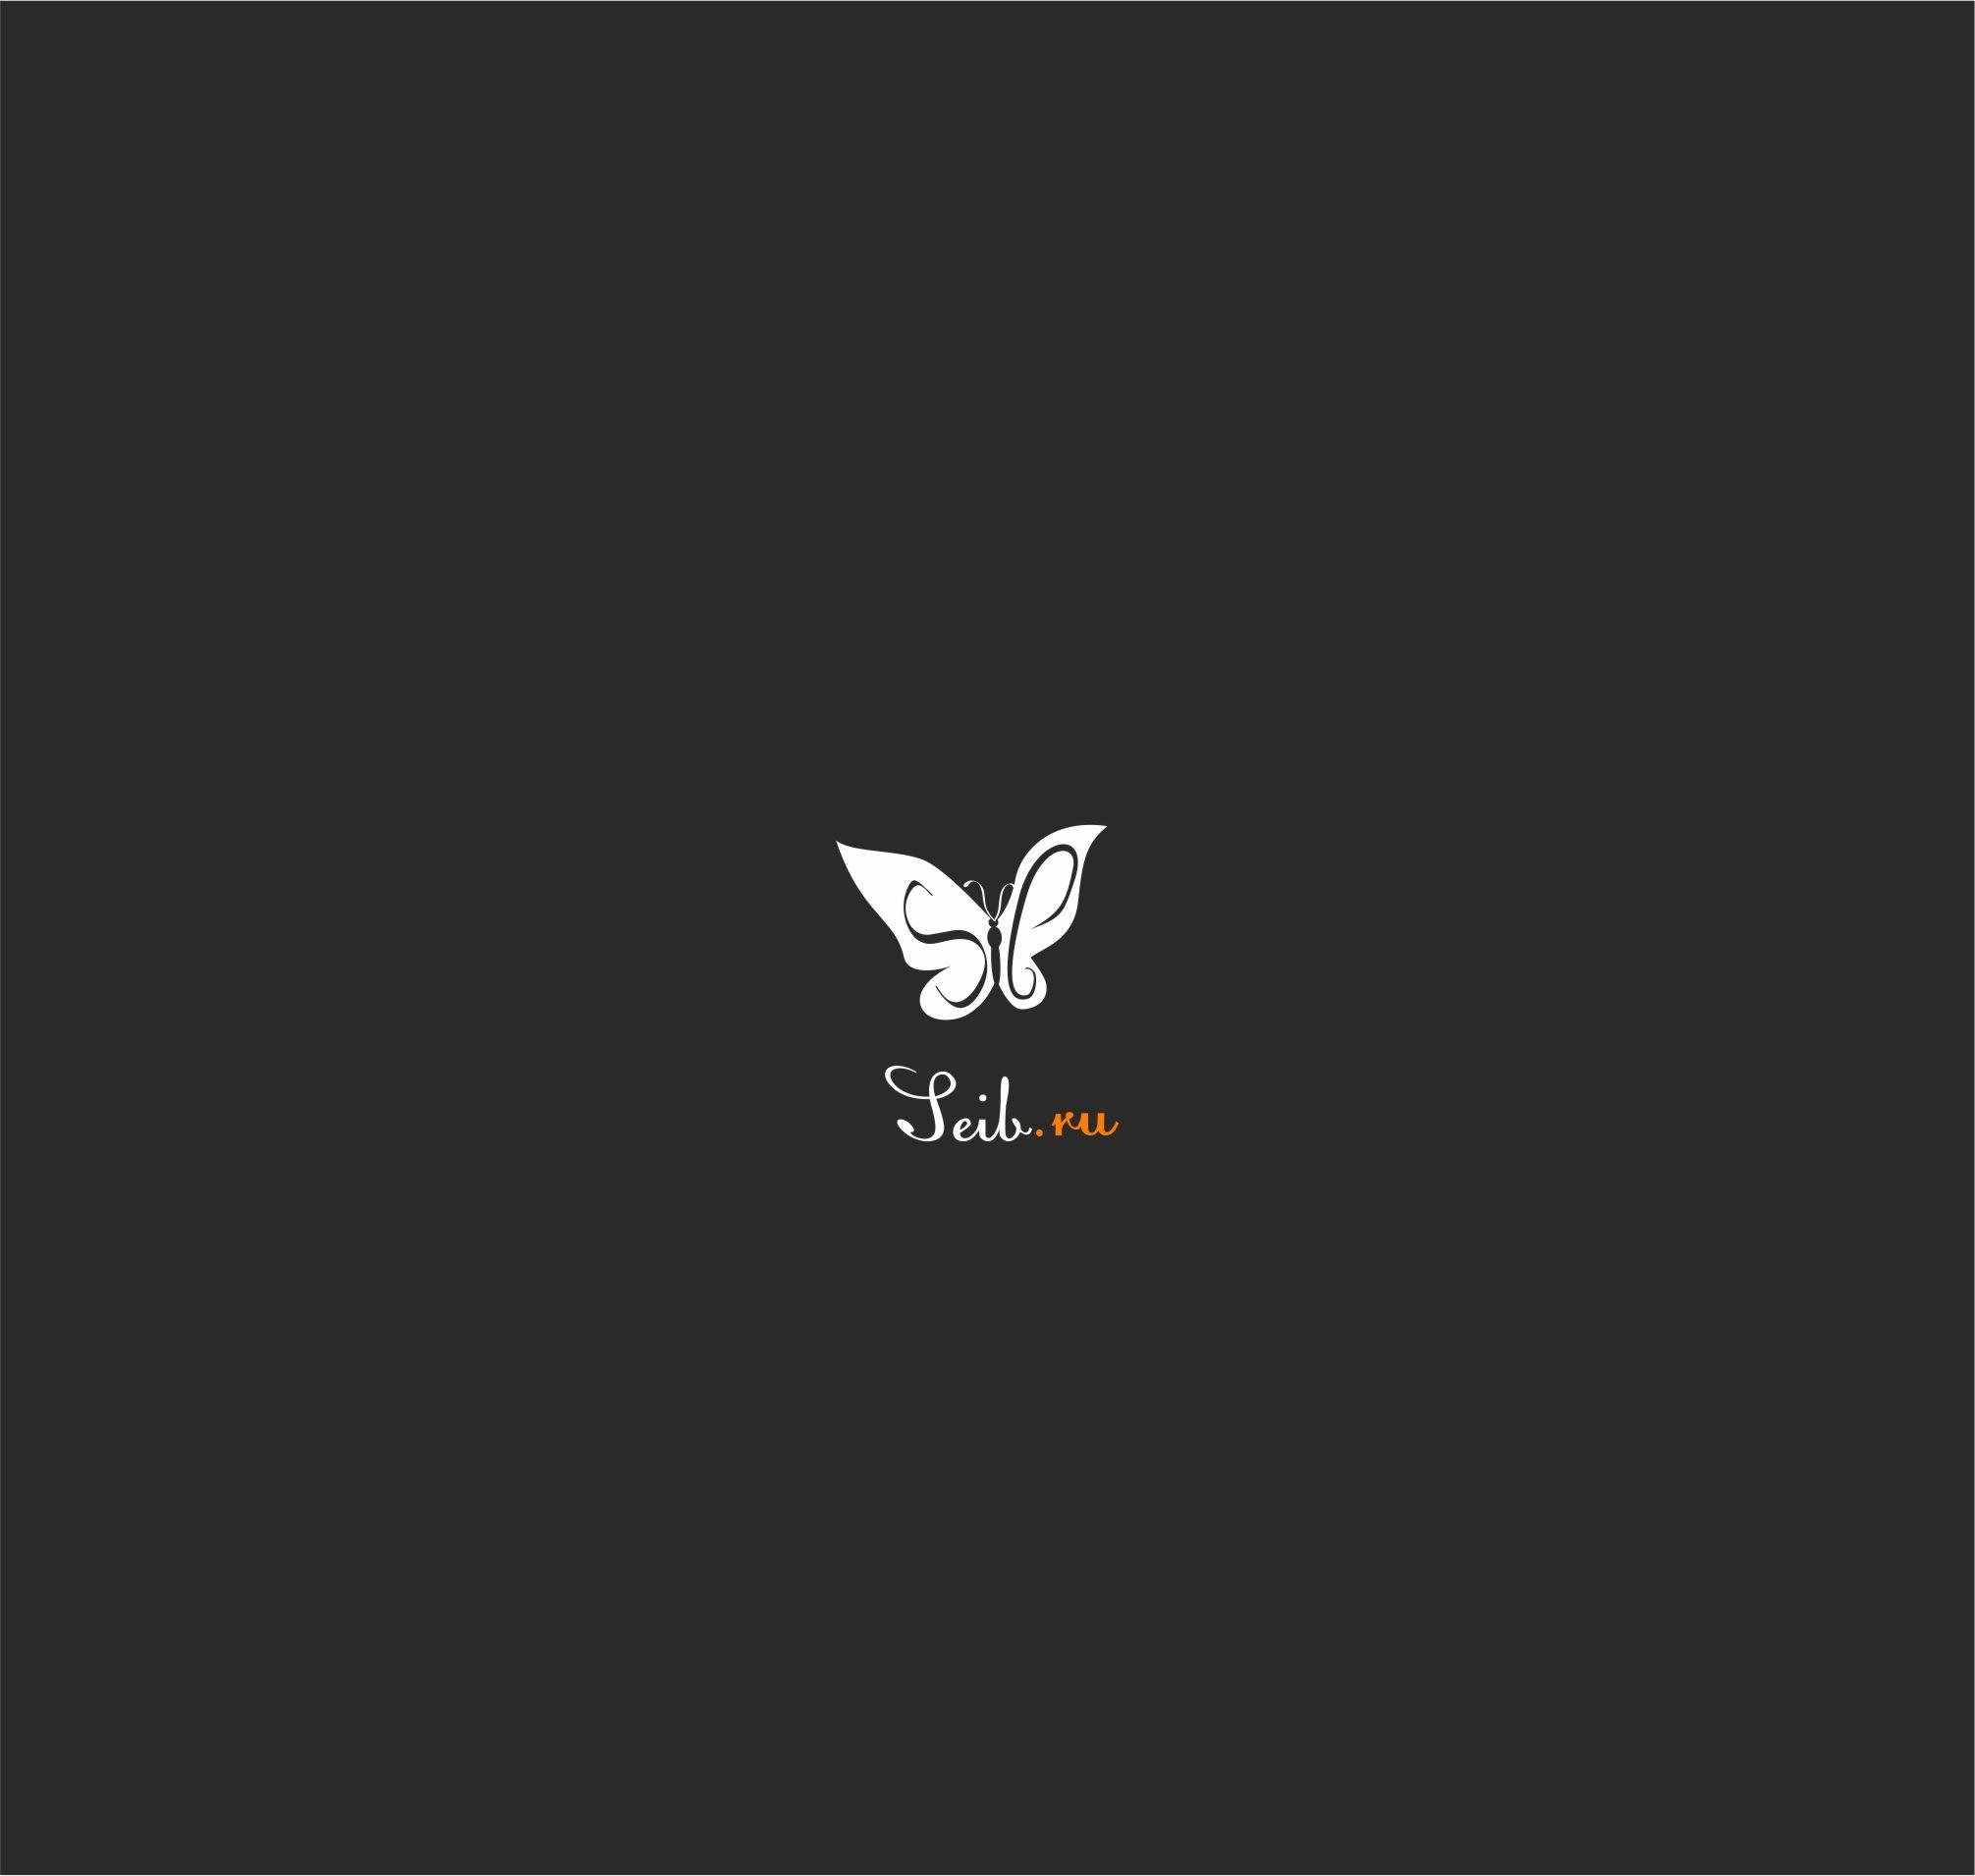 Логотип для инвестиционной компании фото f_3915140d5222a053.jpg